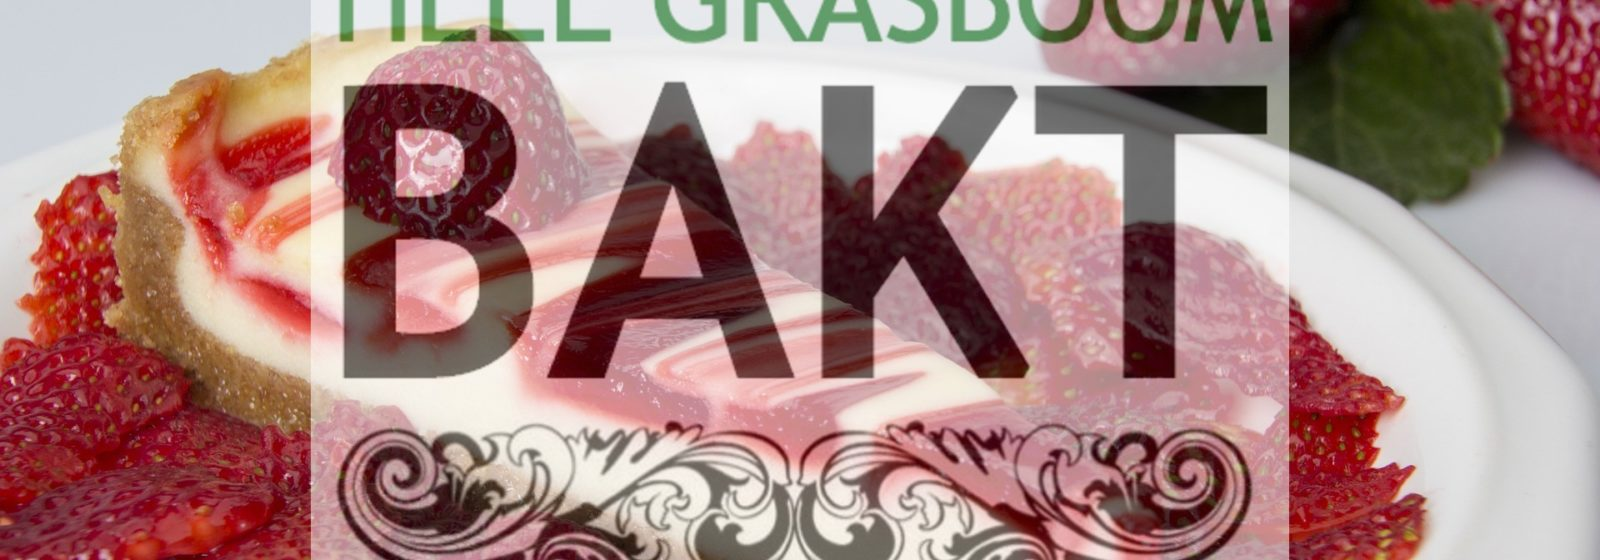 Heel Grasboom bakt – 24 november